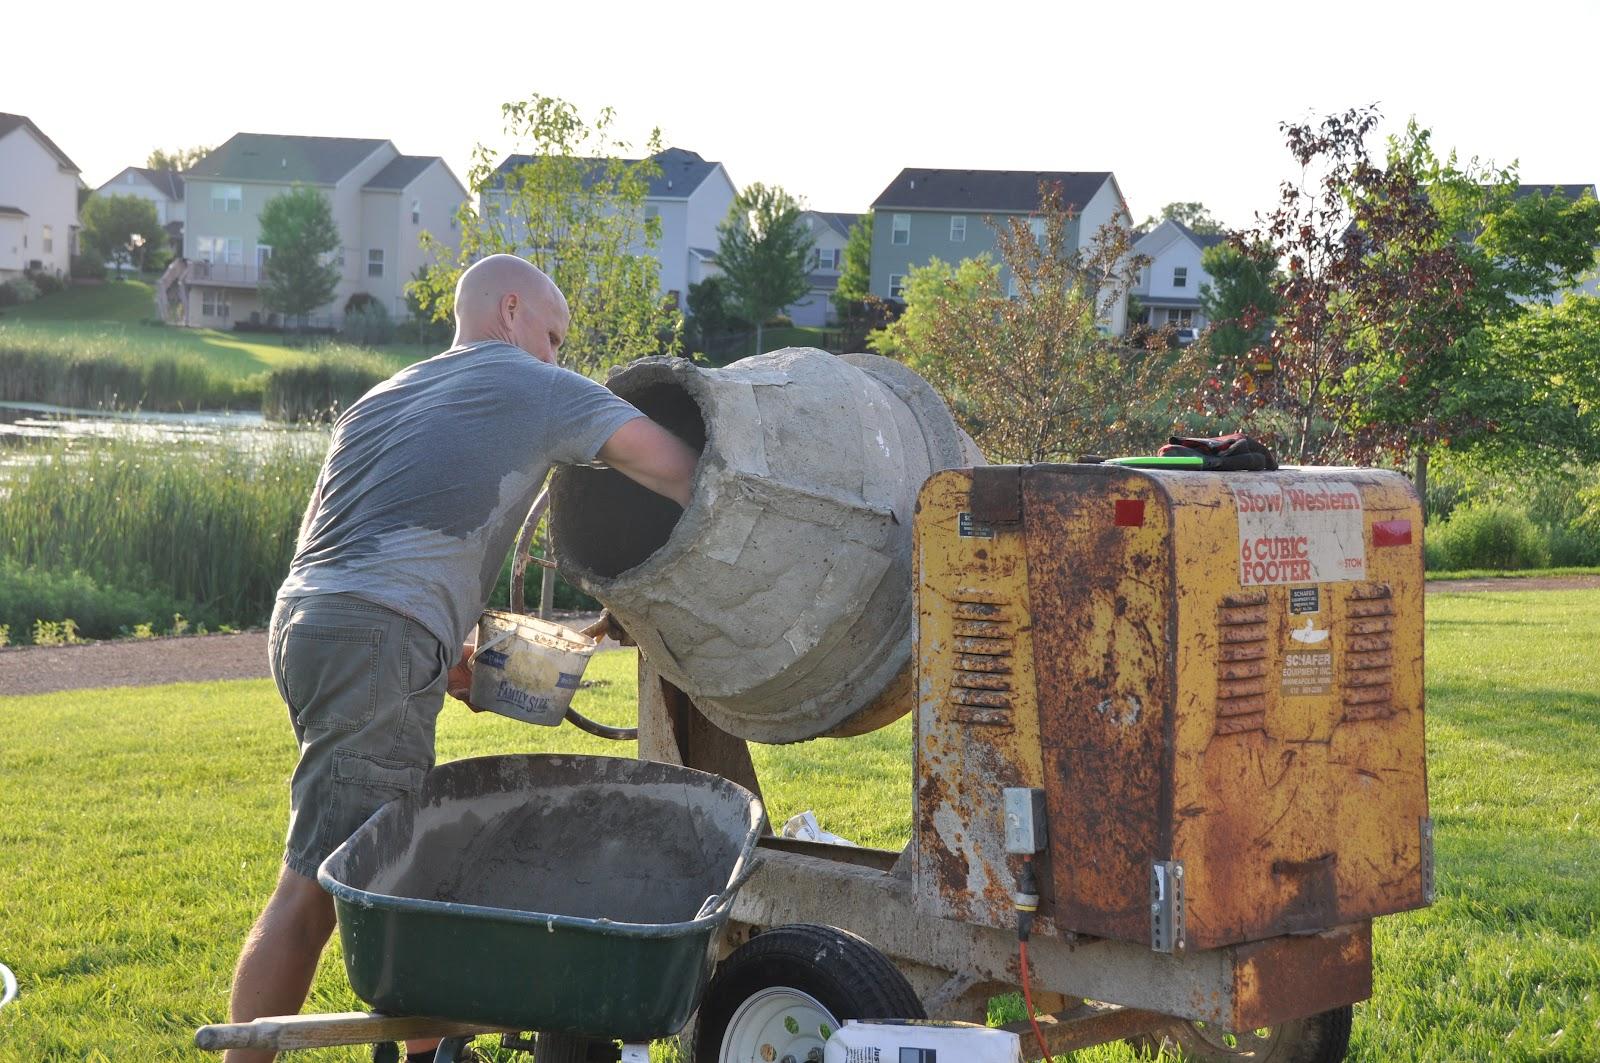 Cement Mixers Make Task Easier